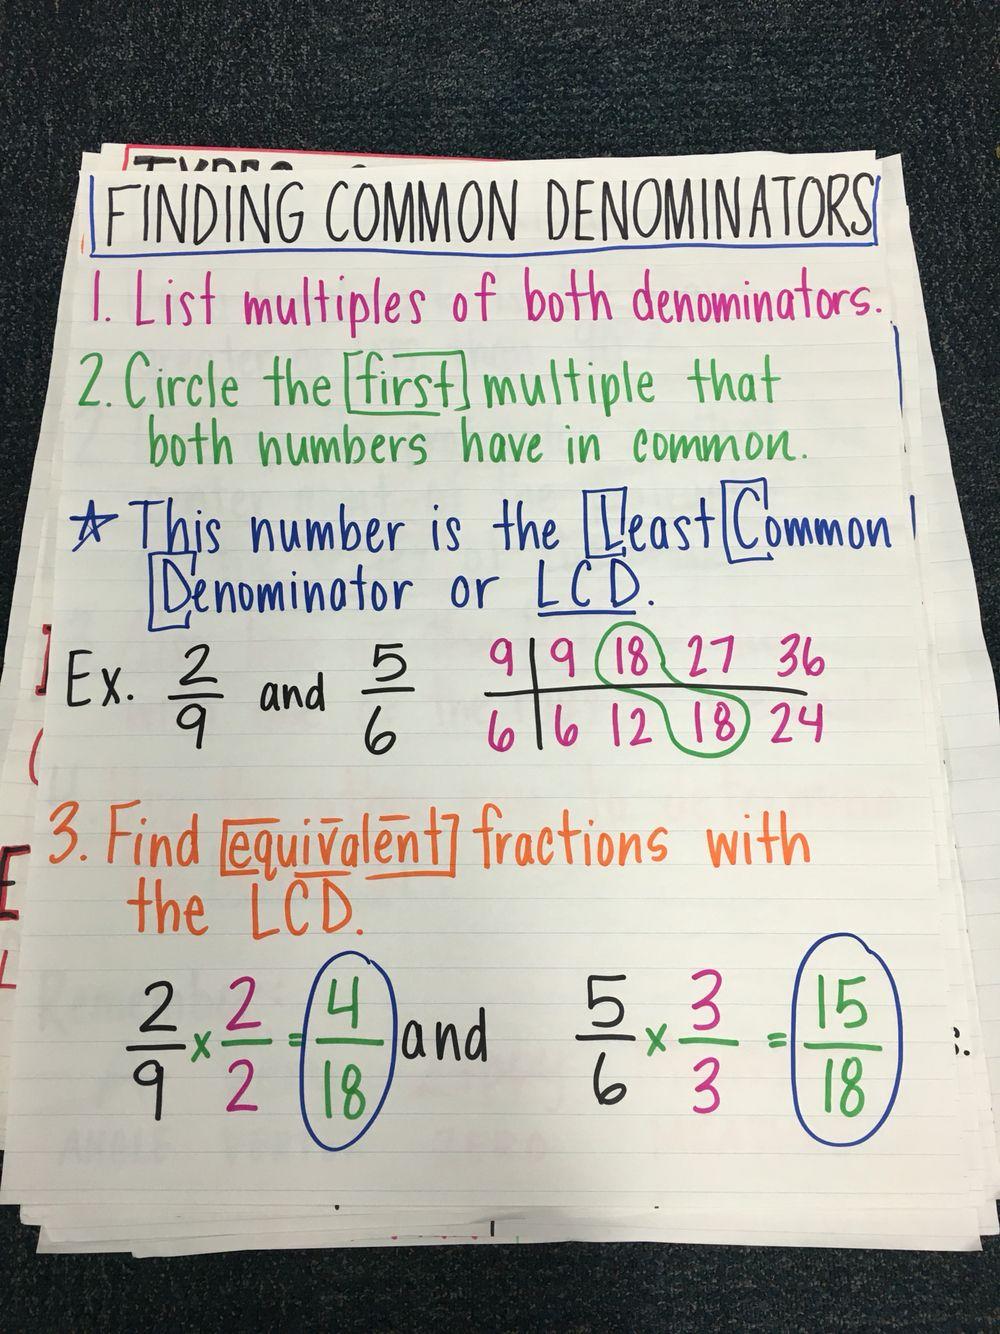 Pin By Mandy Hemelstrand On Math Studying Math Math Lessons Learning Math Khan academy adding digit numbers